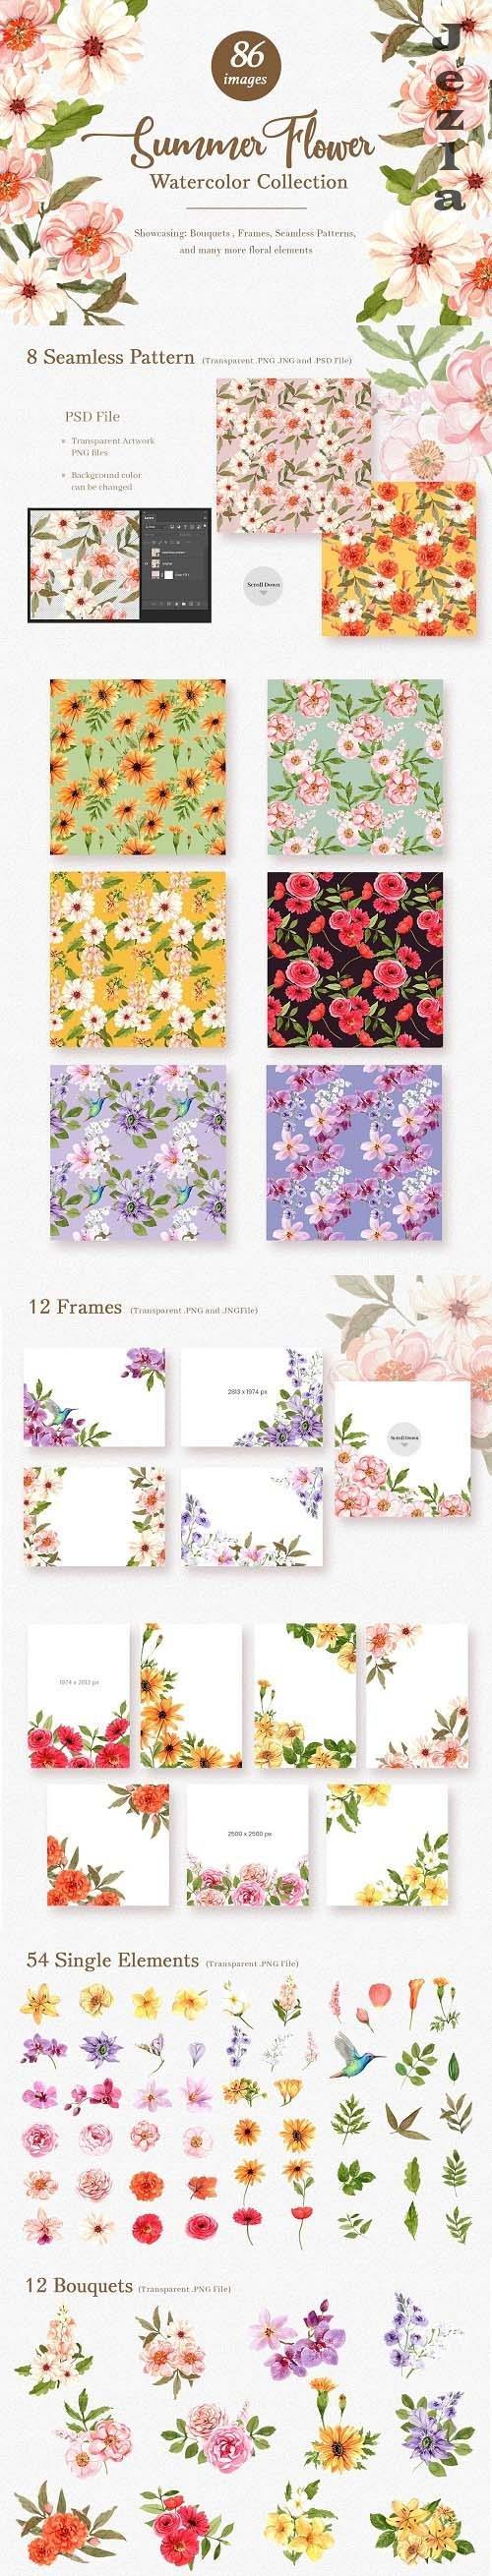 Summer Flower wedding watercolor - 6298125